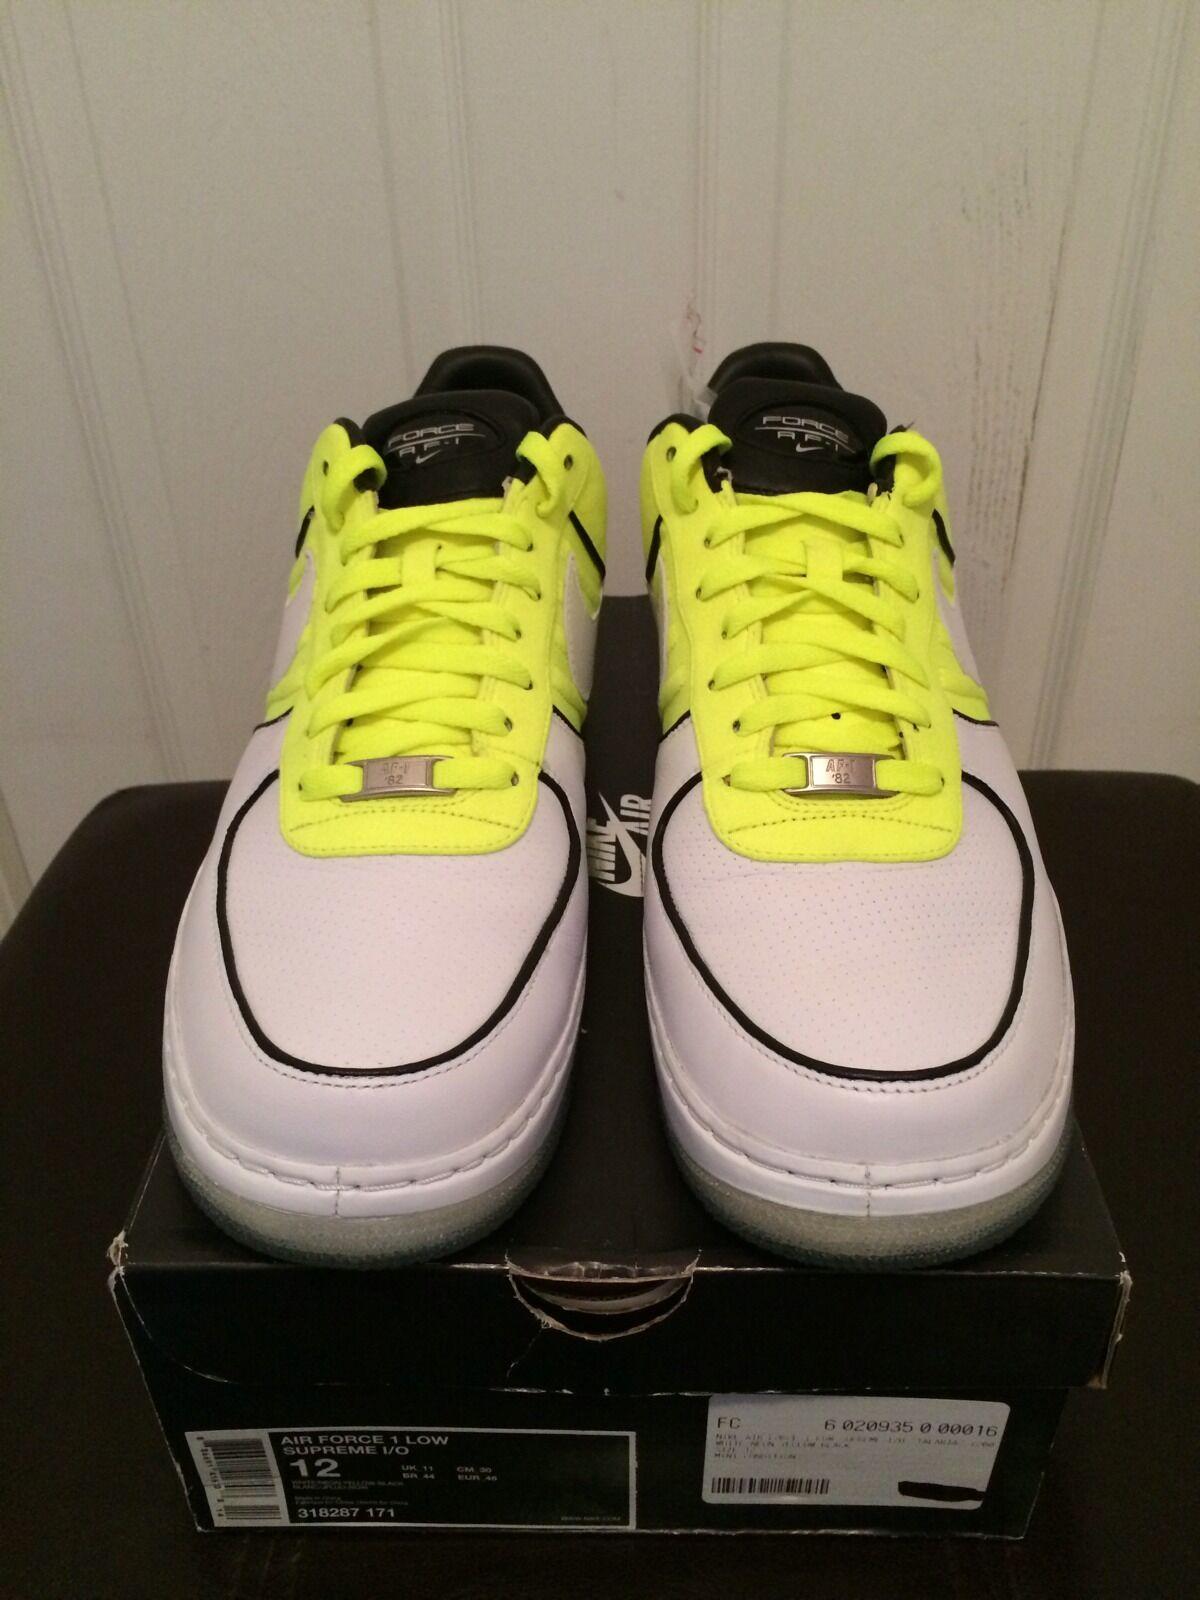 Nike Air Force 1 Low Supreme I/O Talaria VNDS 318287 171 Sz 12